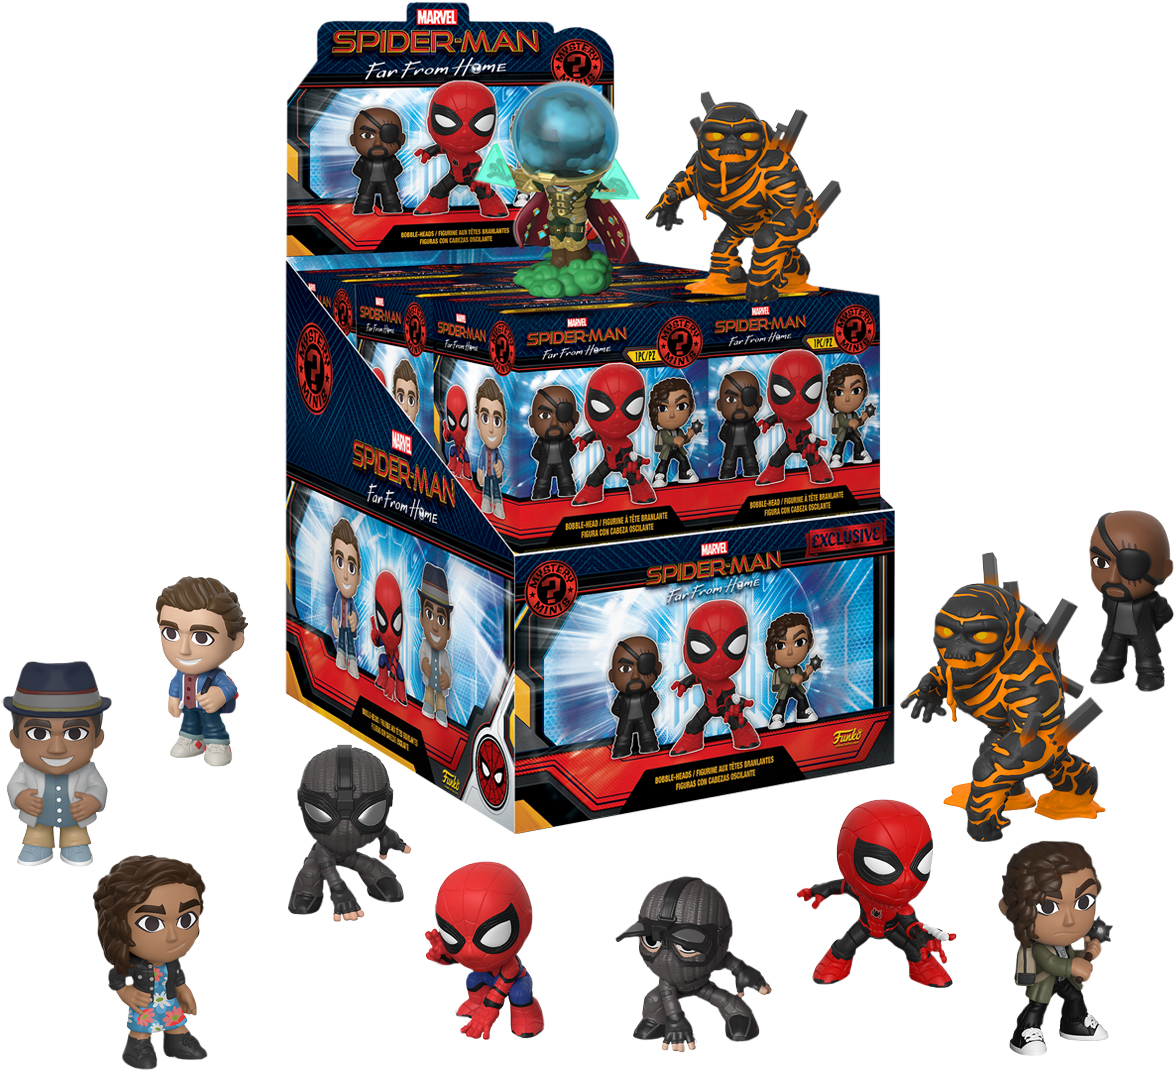 Фигурка Funko Mystery Minis Blind Box: Spider-Man: Far From Home – Exclusive 1 (1 шт. в ассортименте) фото